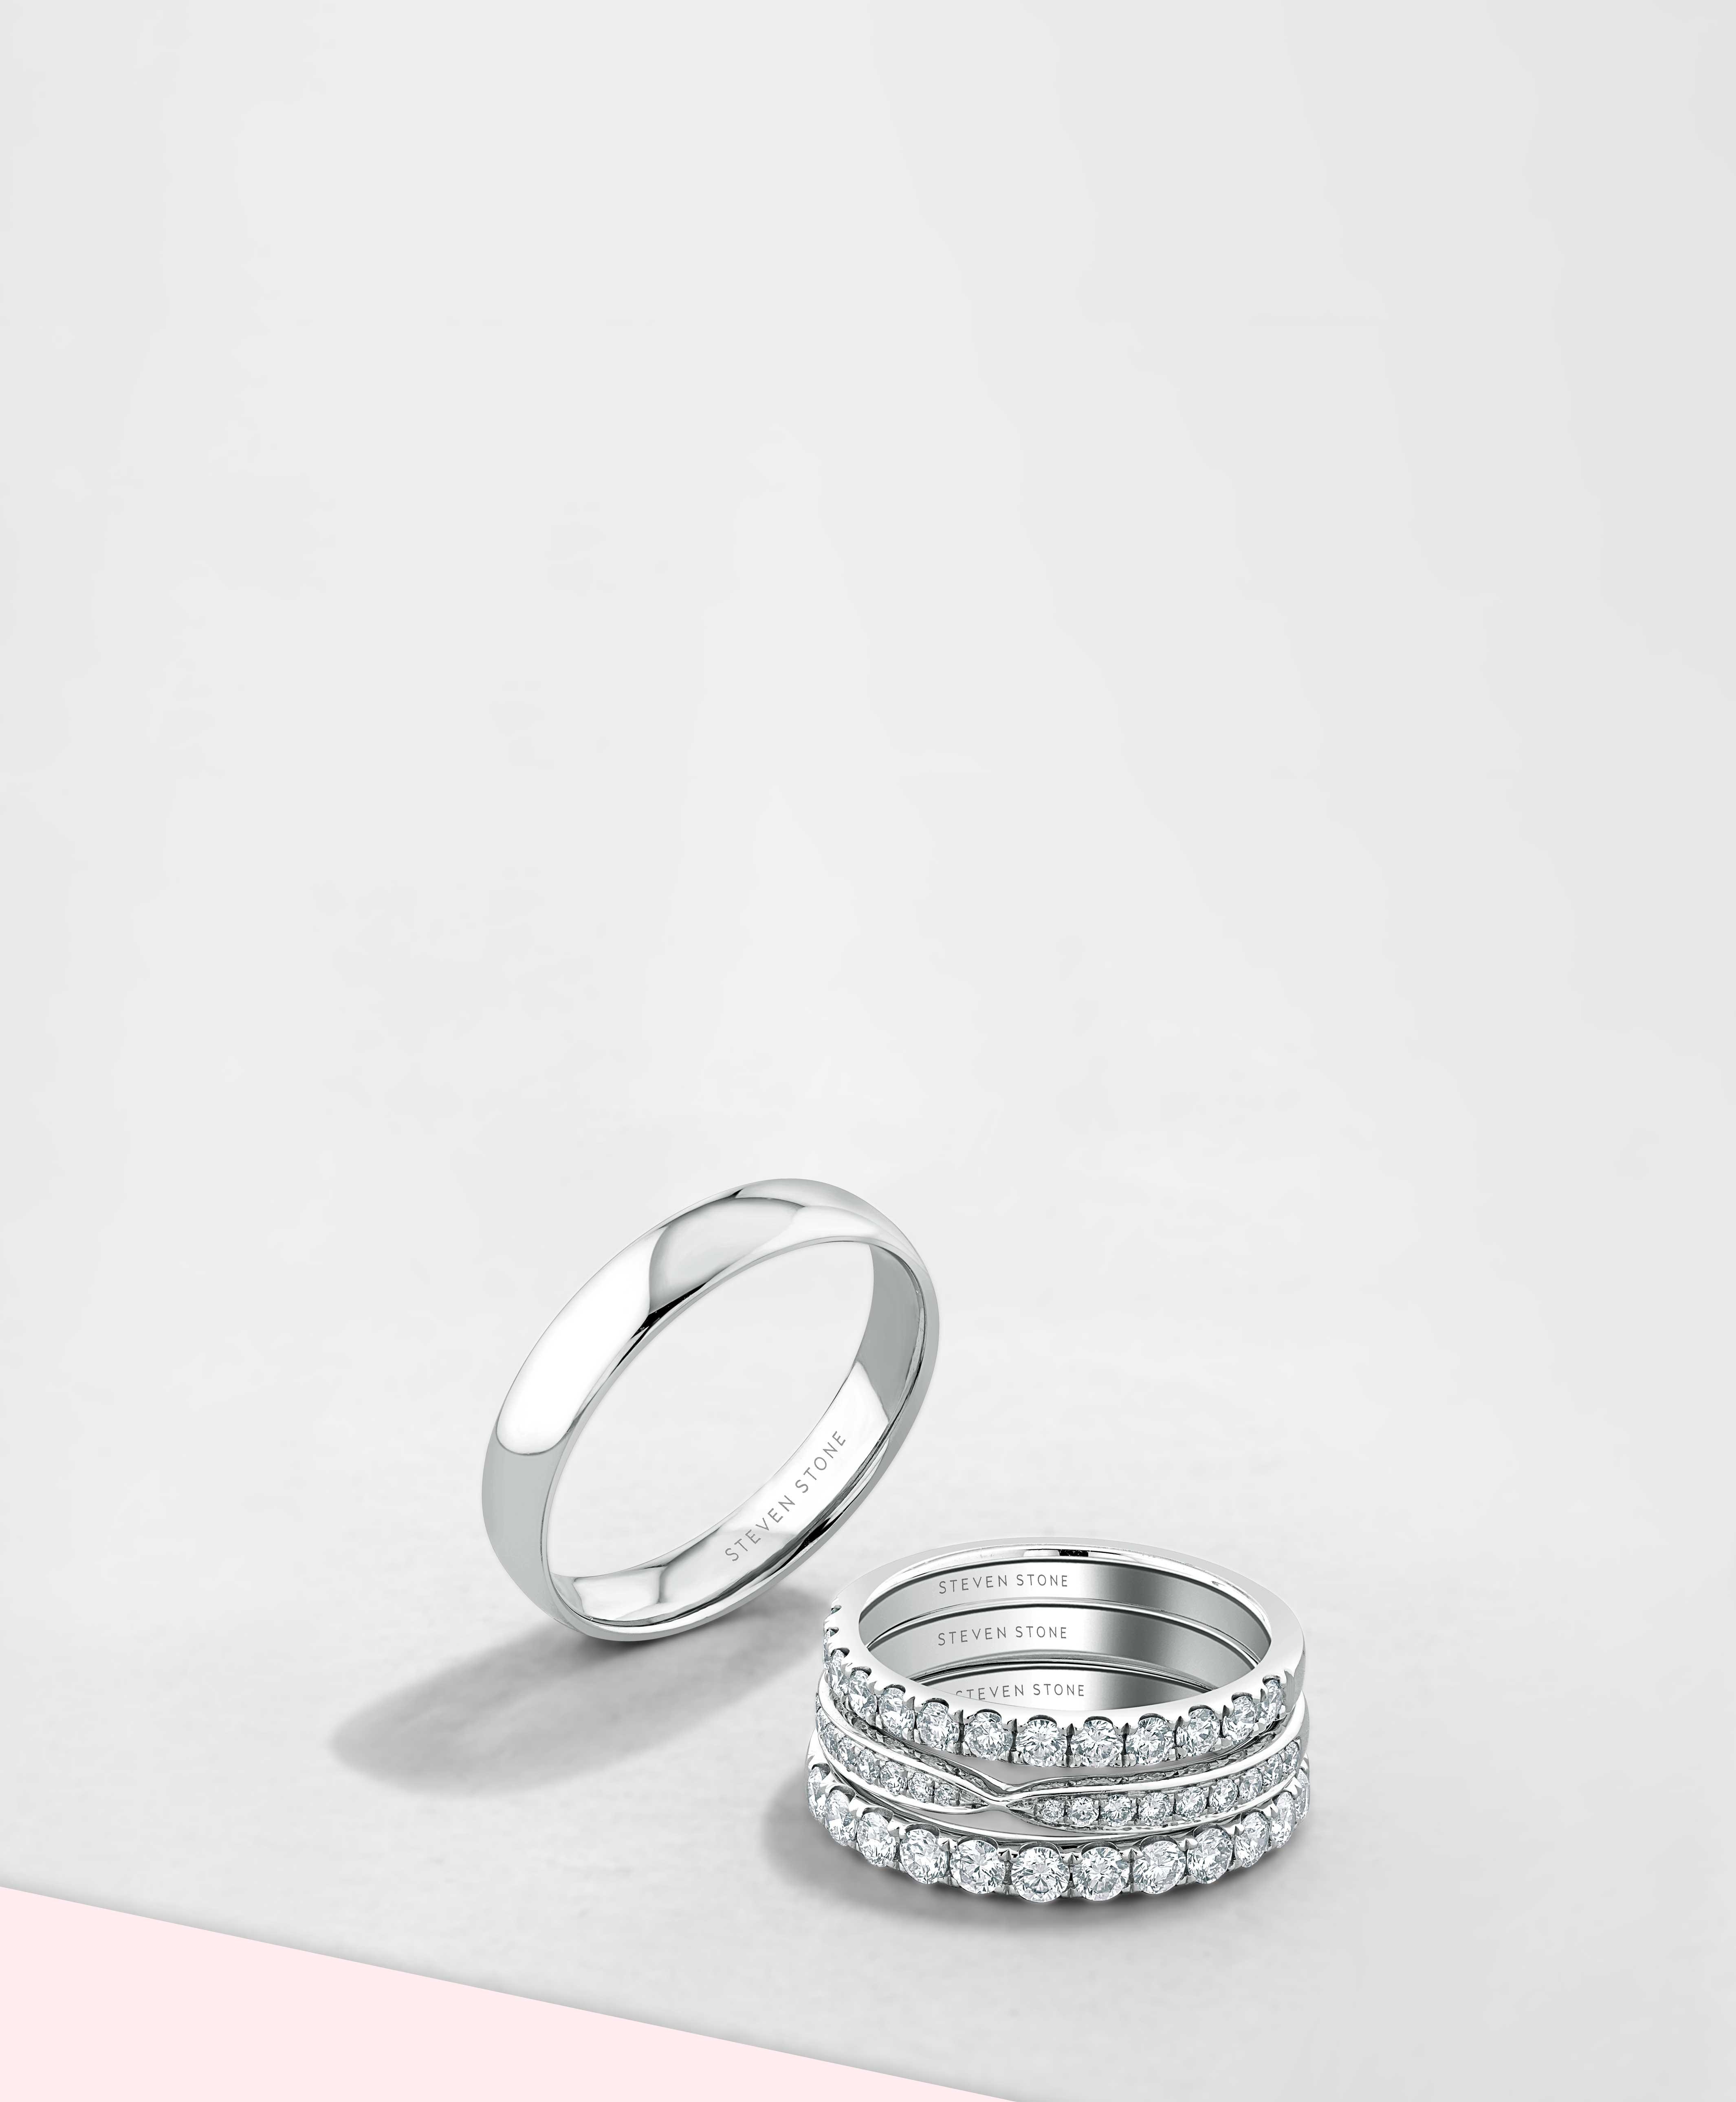 Palladium Diamond Wedding Rings - Steven Stone